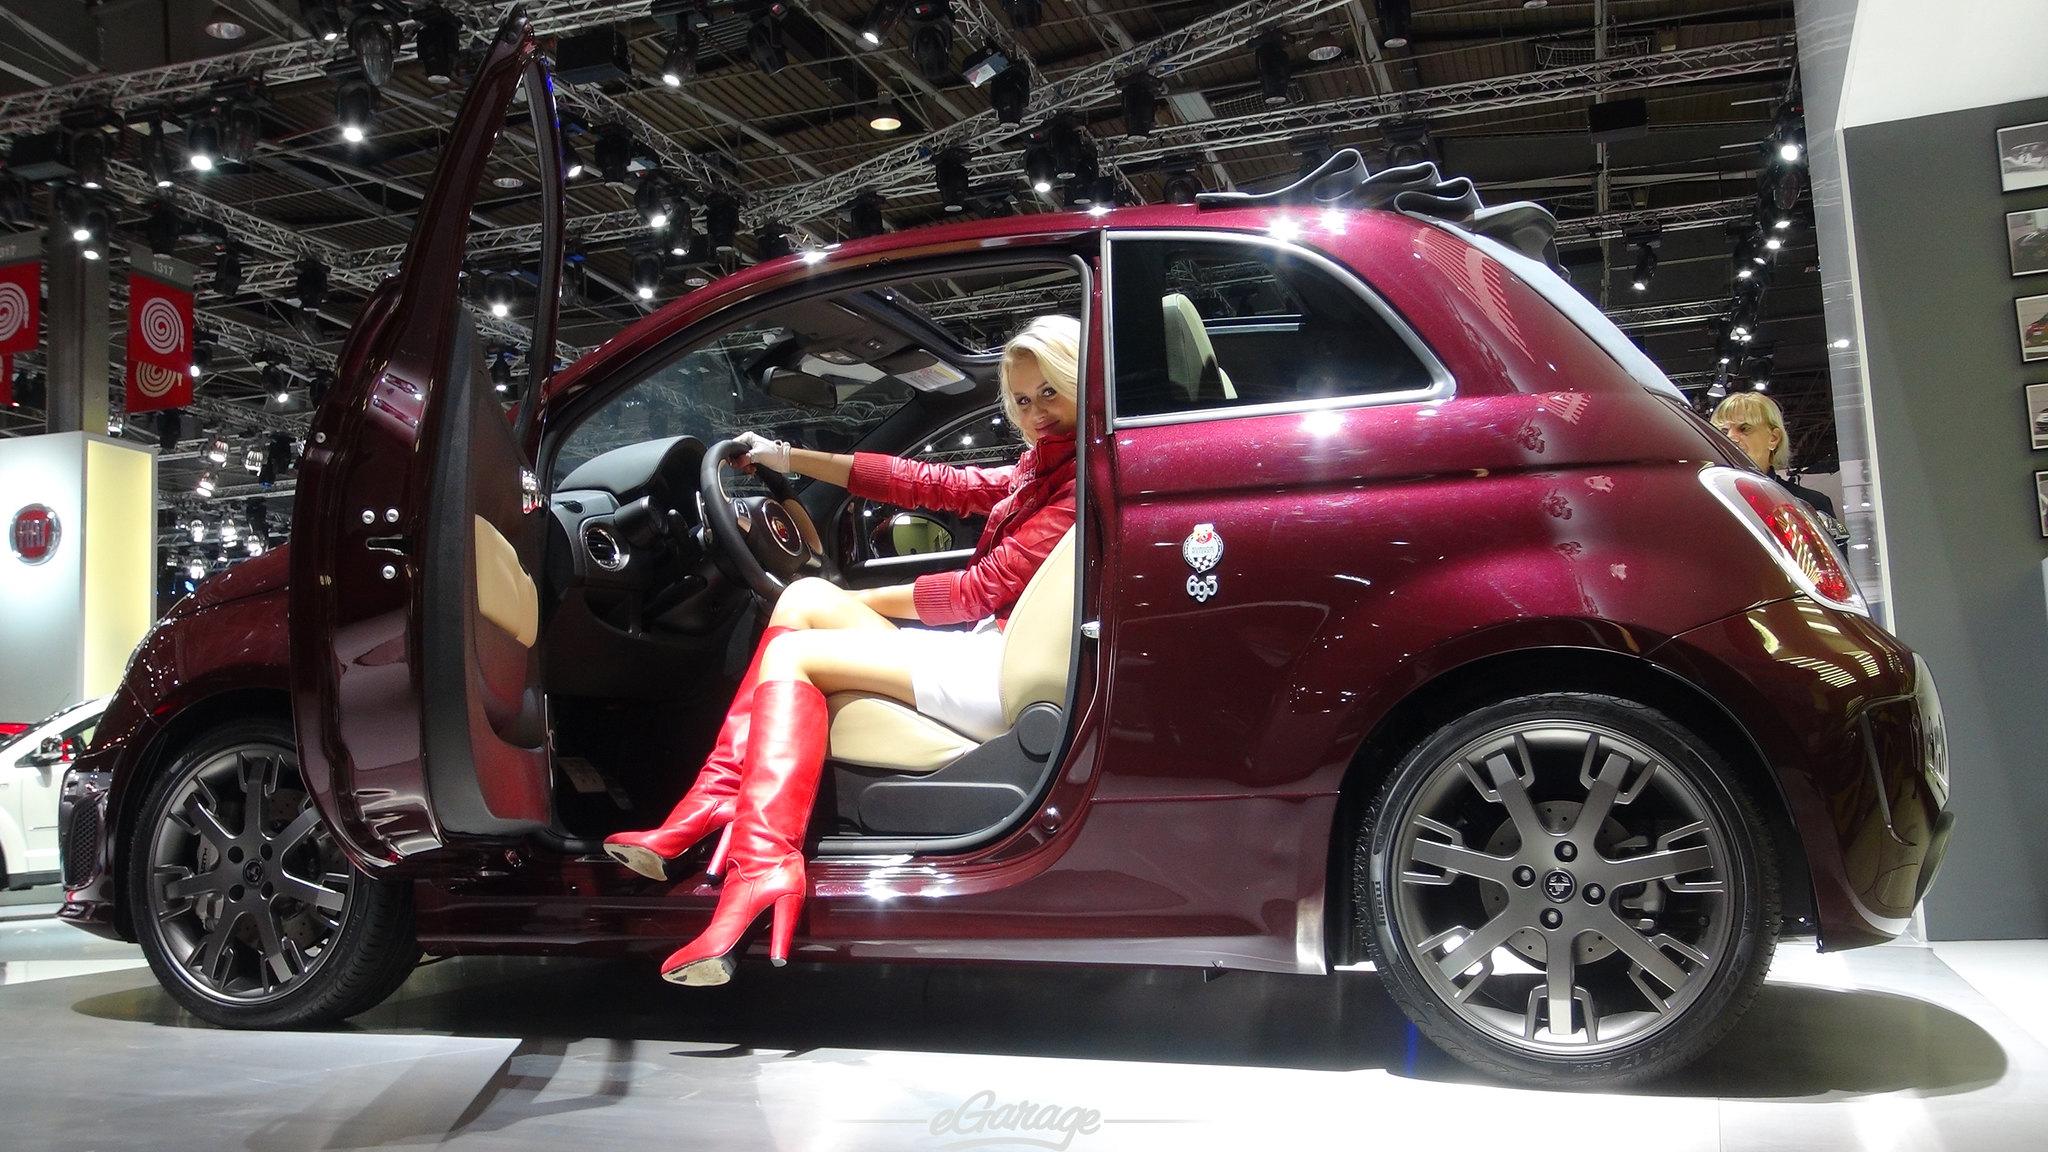 8034745200 624a68100c k 2012 Paris Motor Show